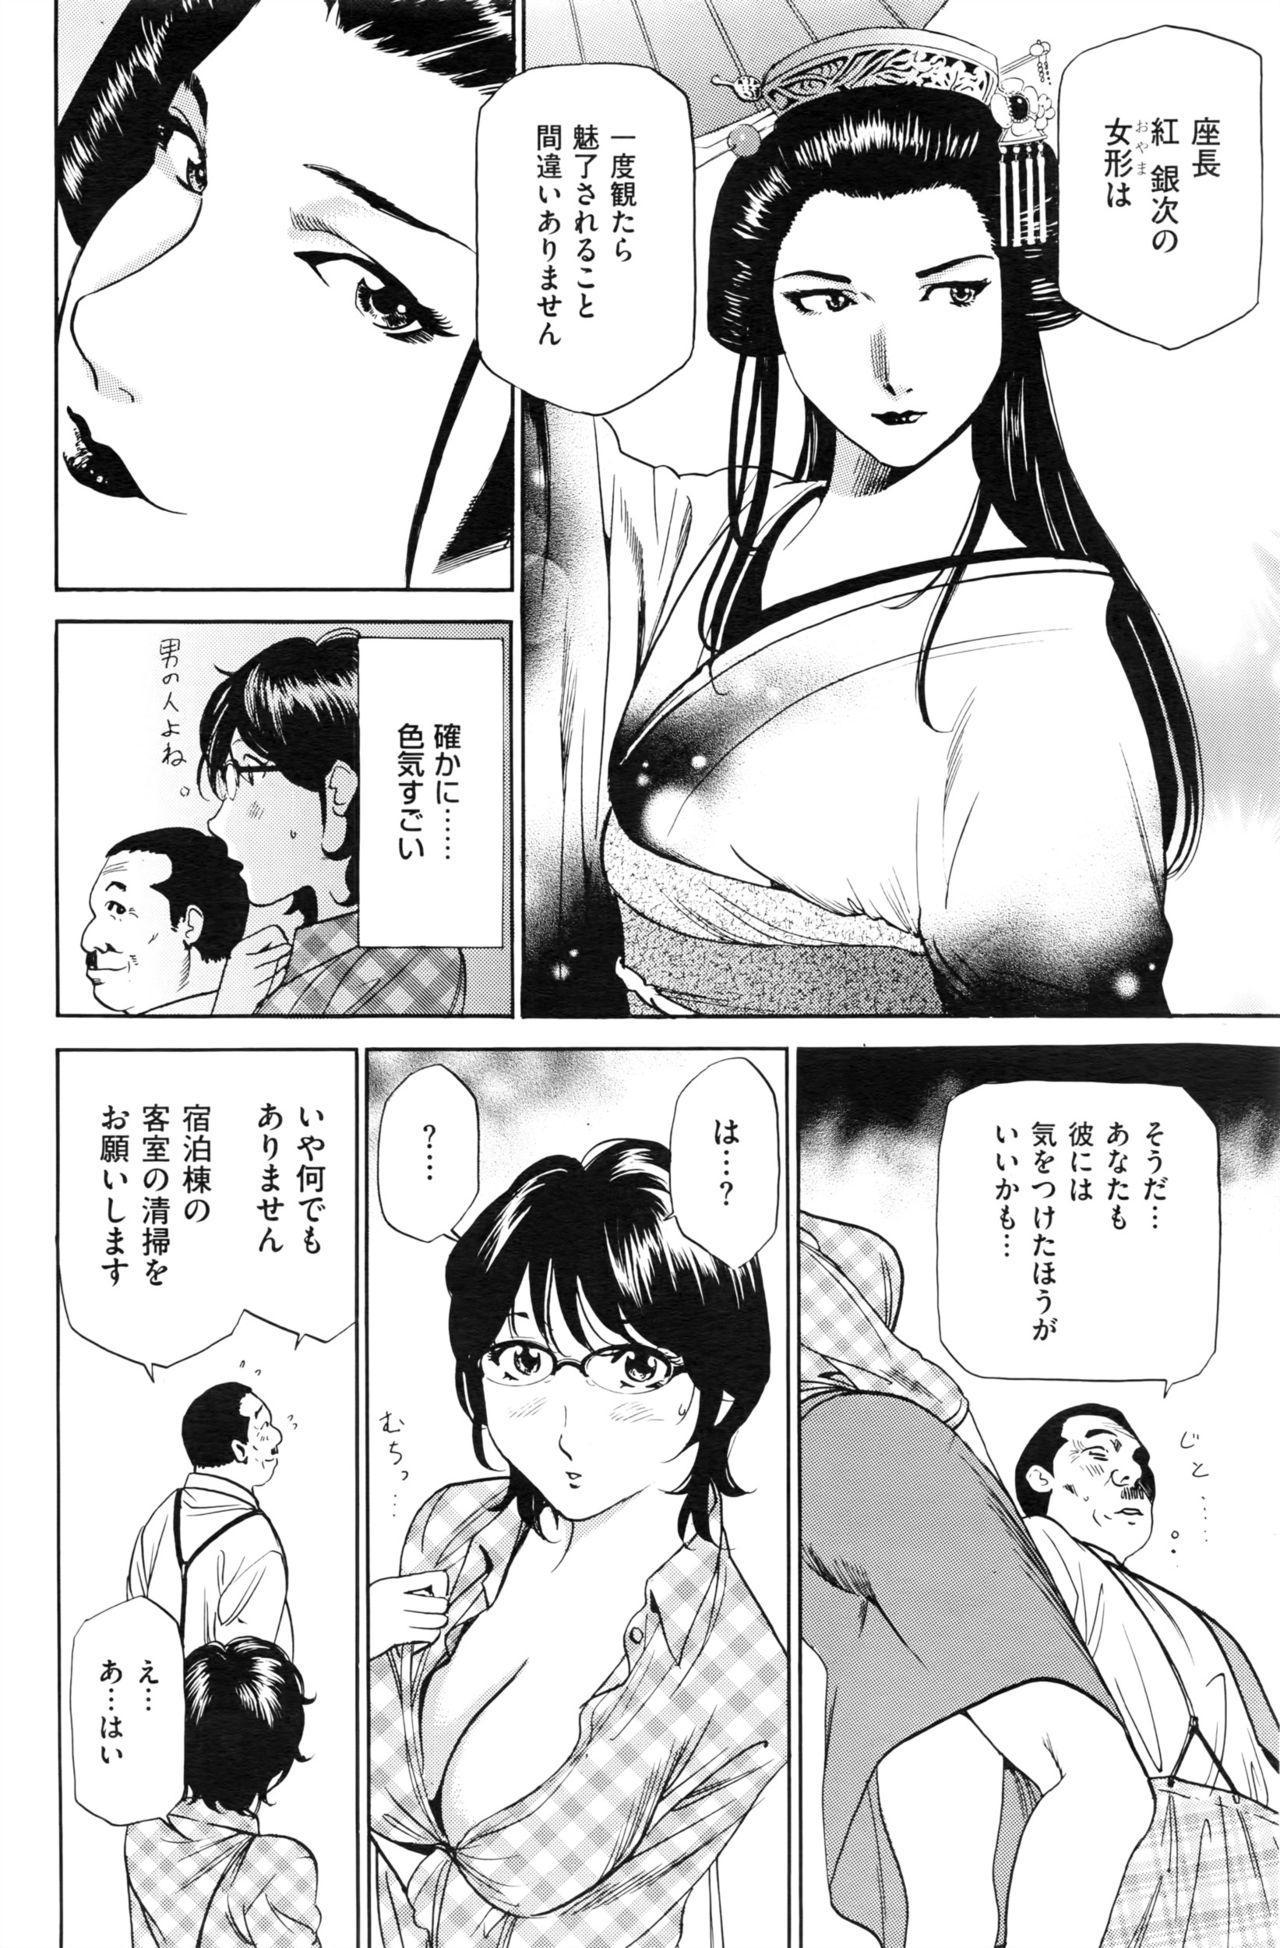 Wa Usuki Ipa a 1-10 58